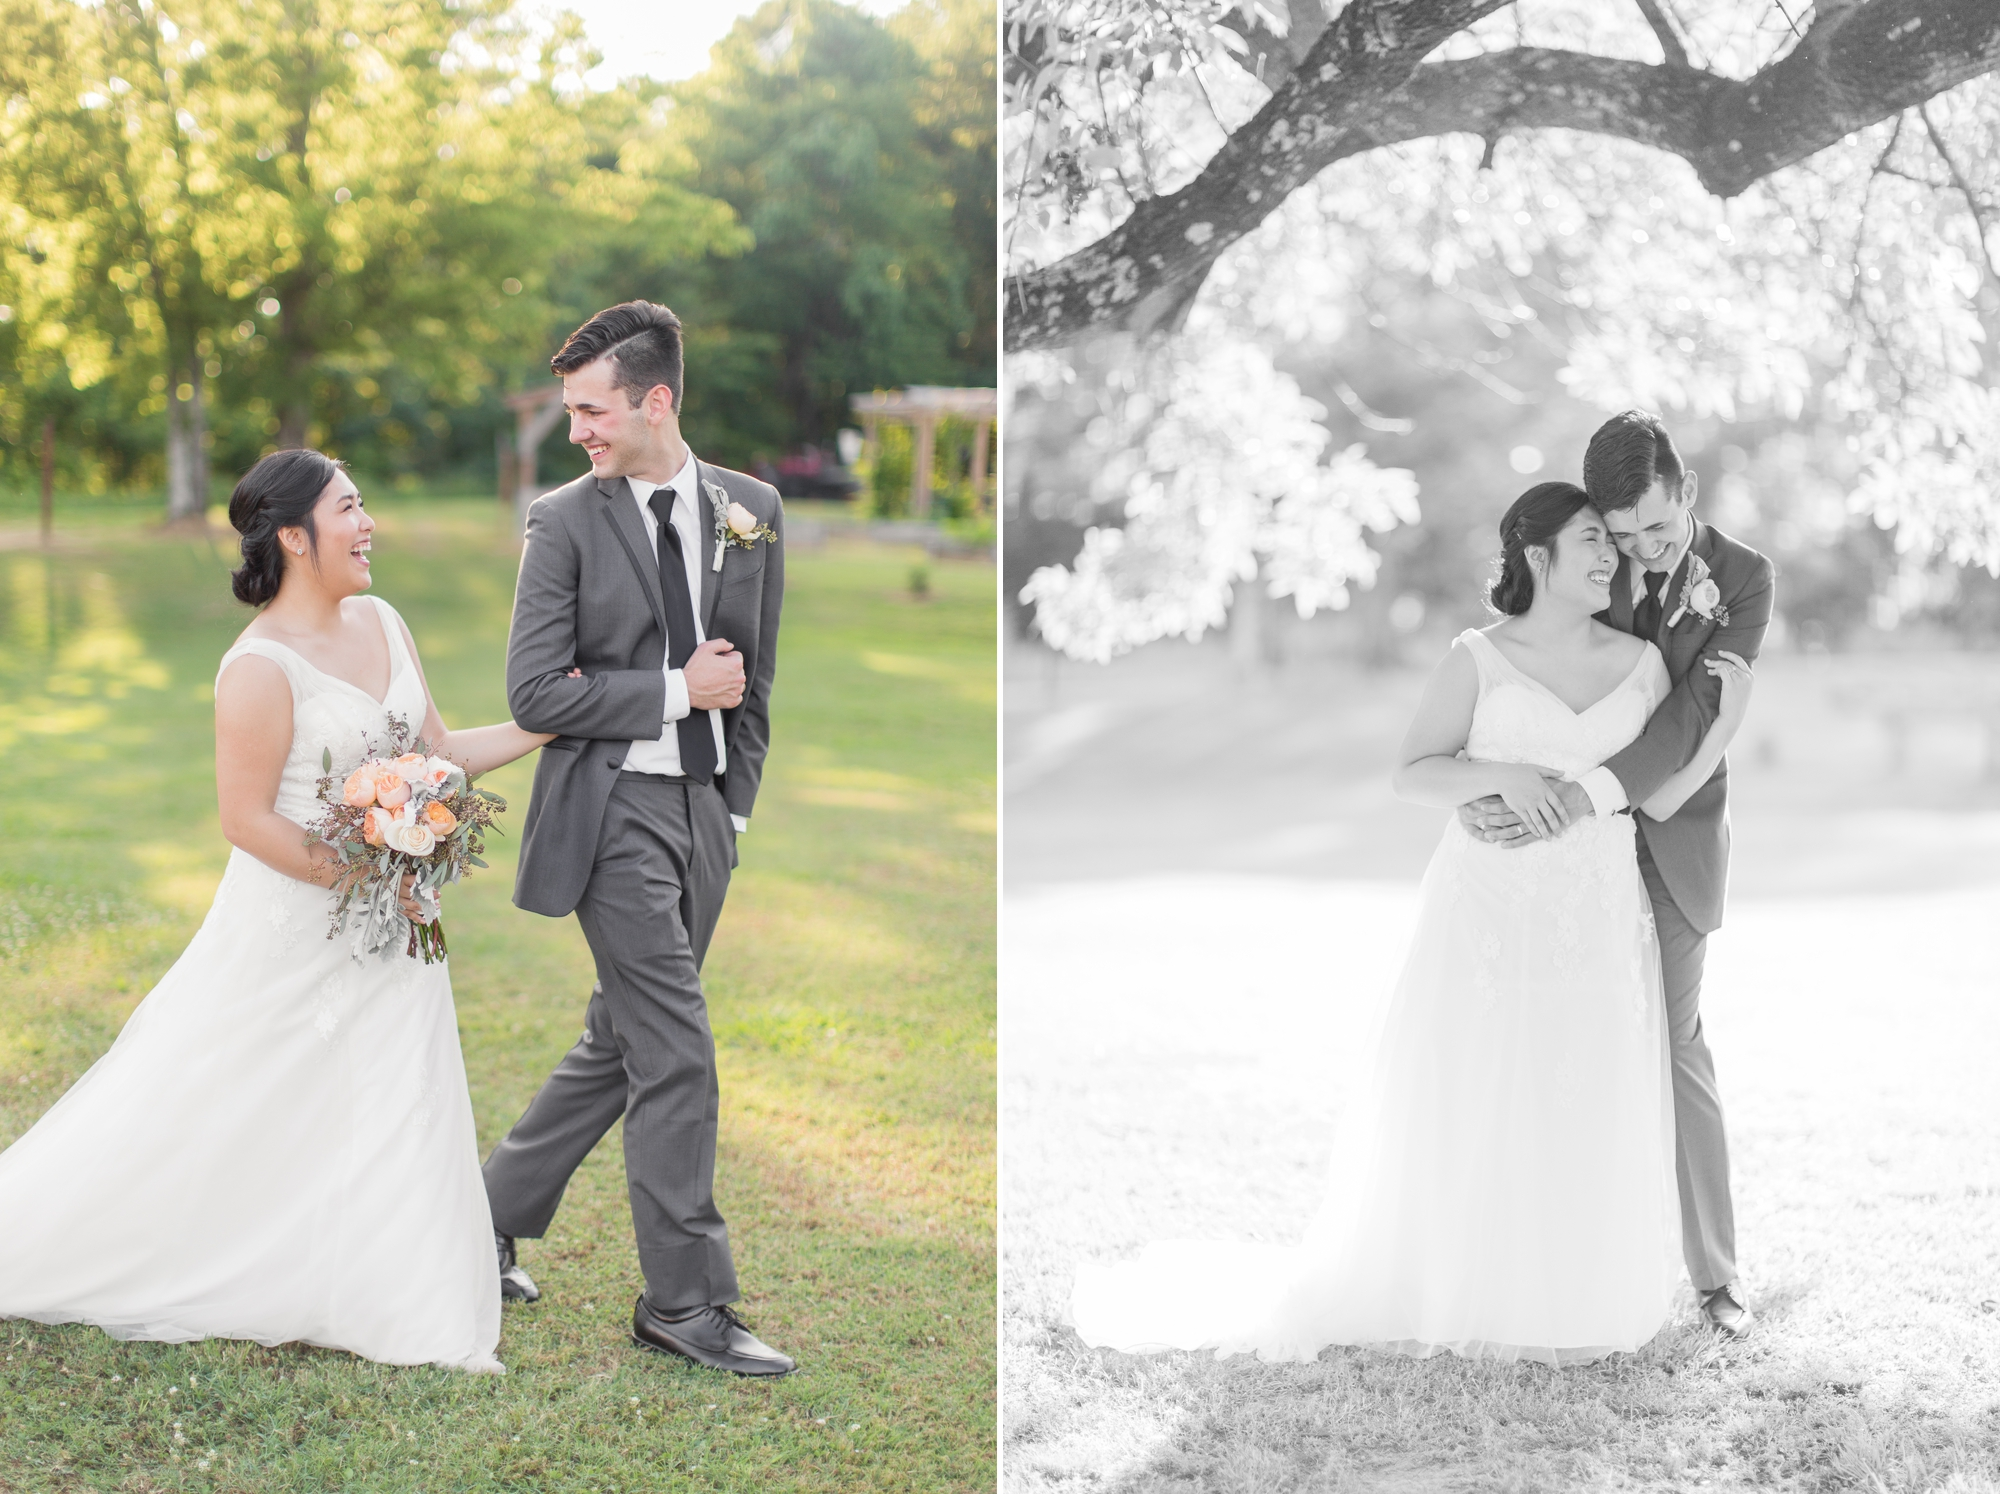 giles wedding blog 35.jpg